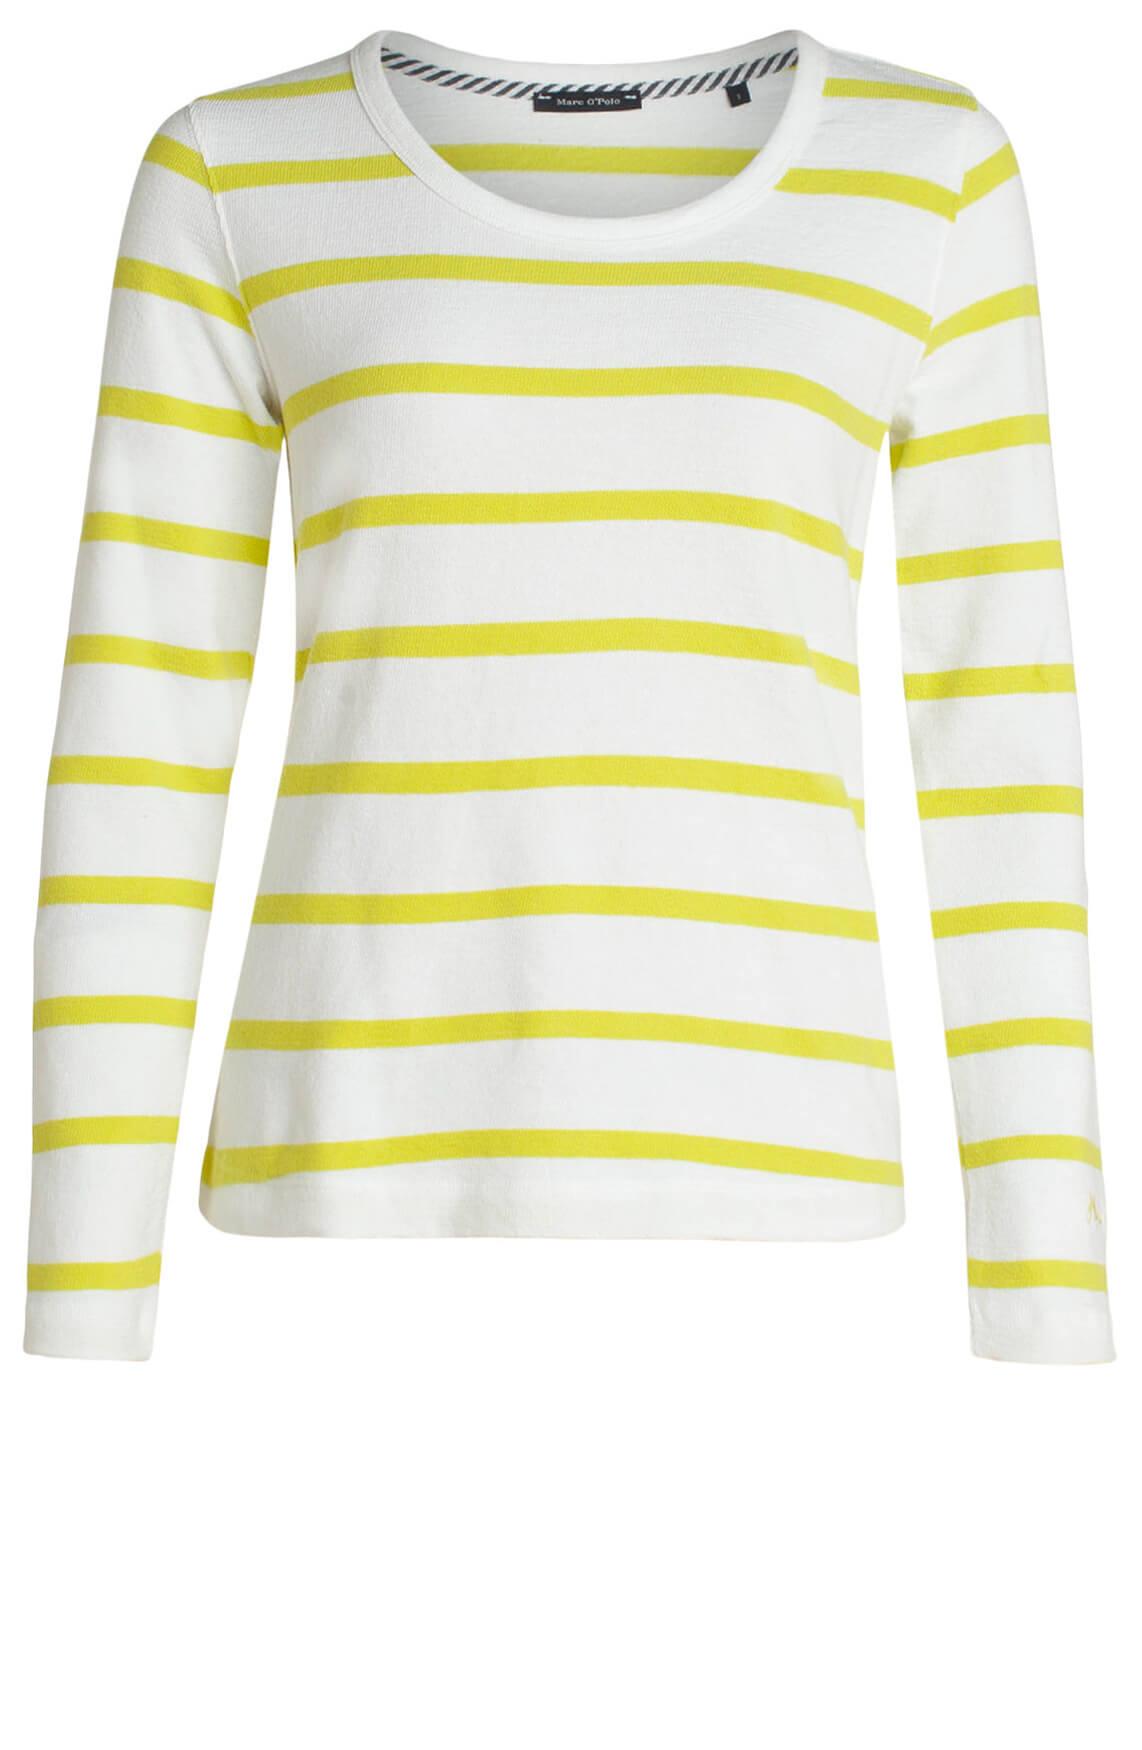 Marc O'Polo Dames Gestreept shirt wit